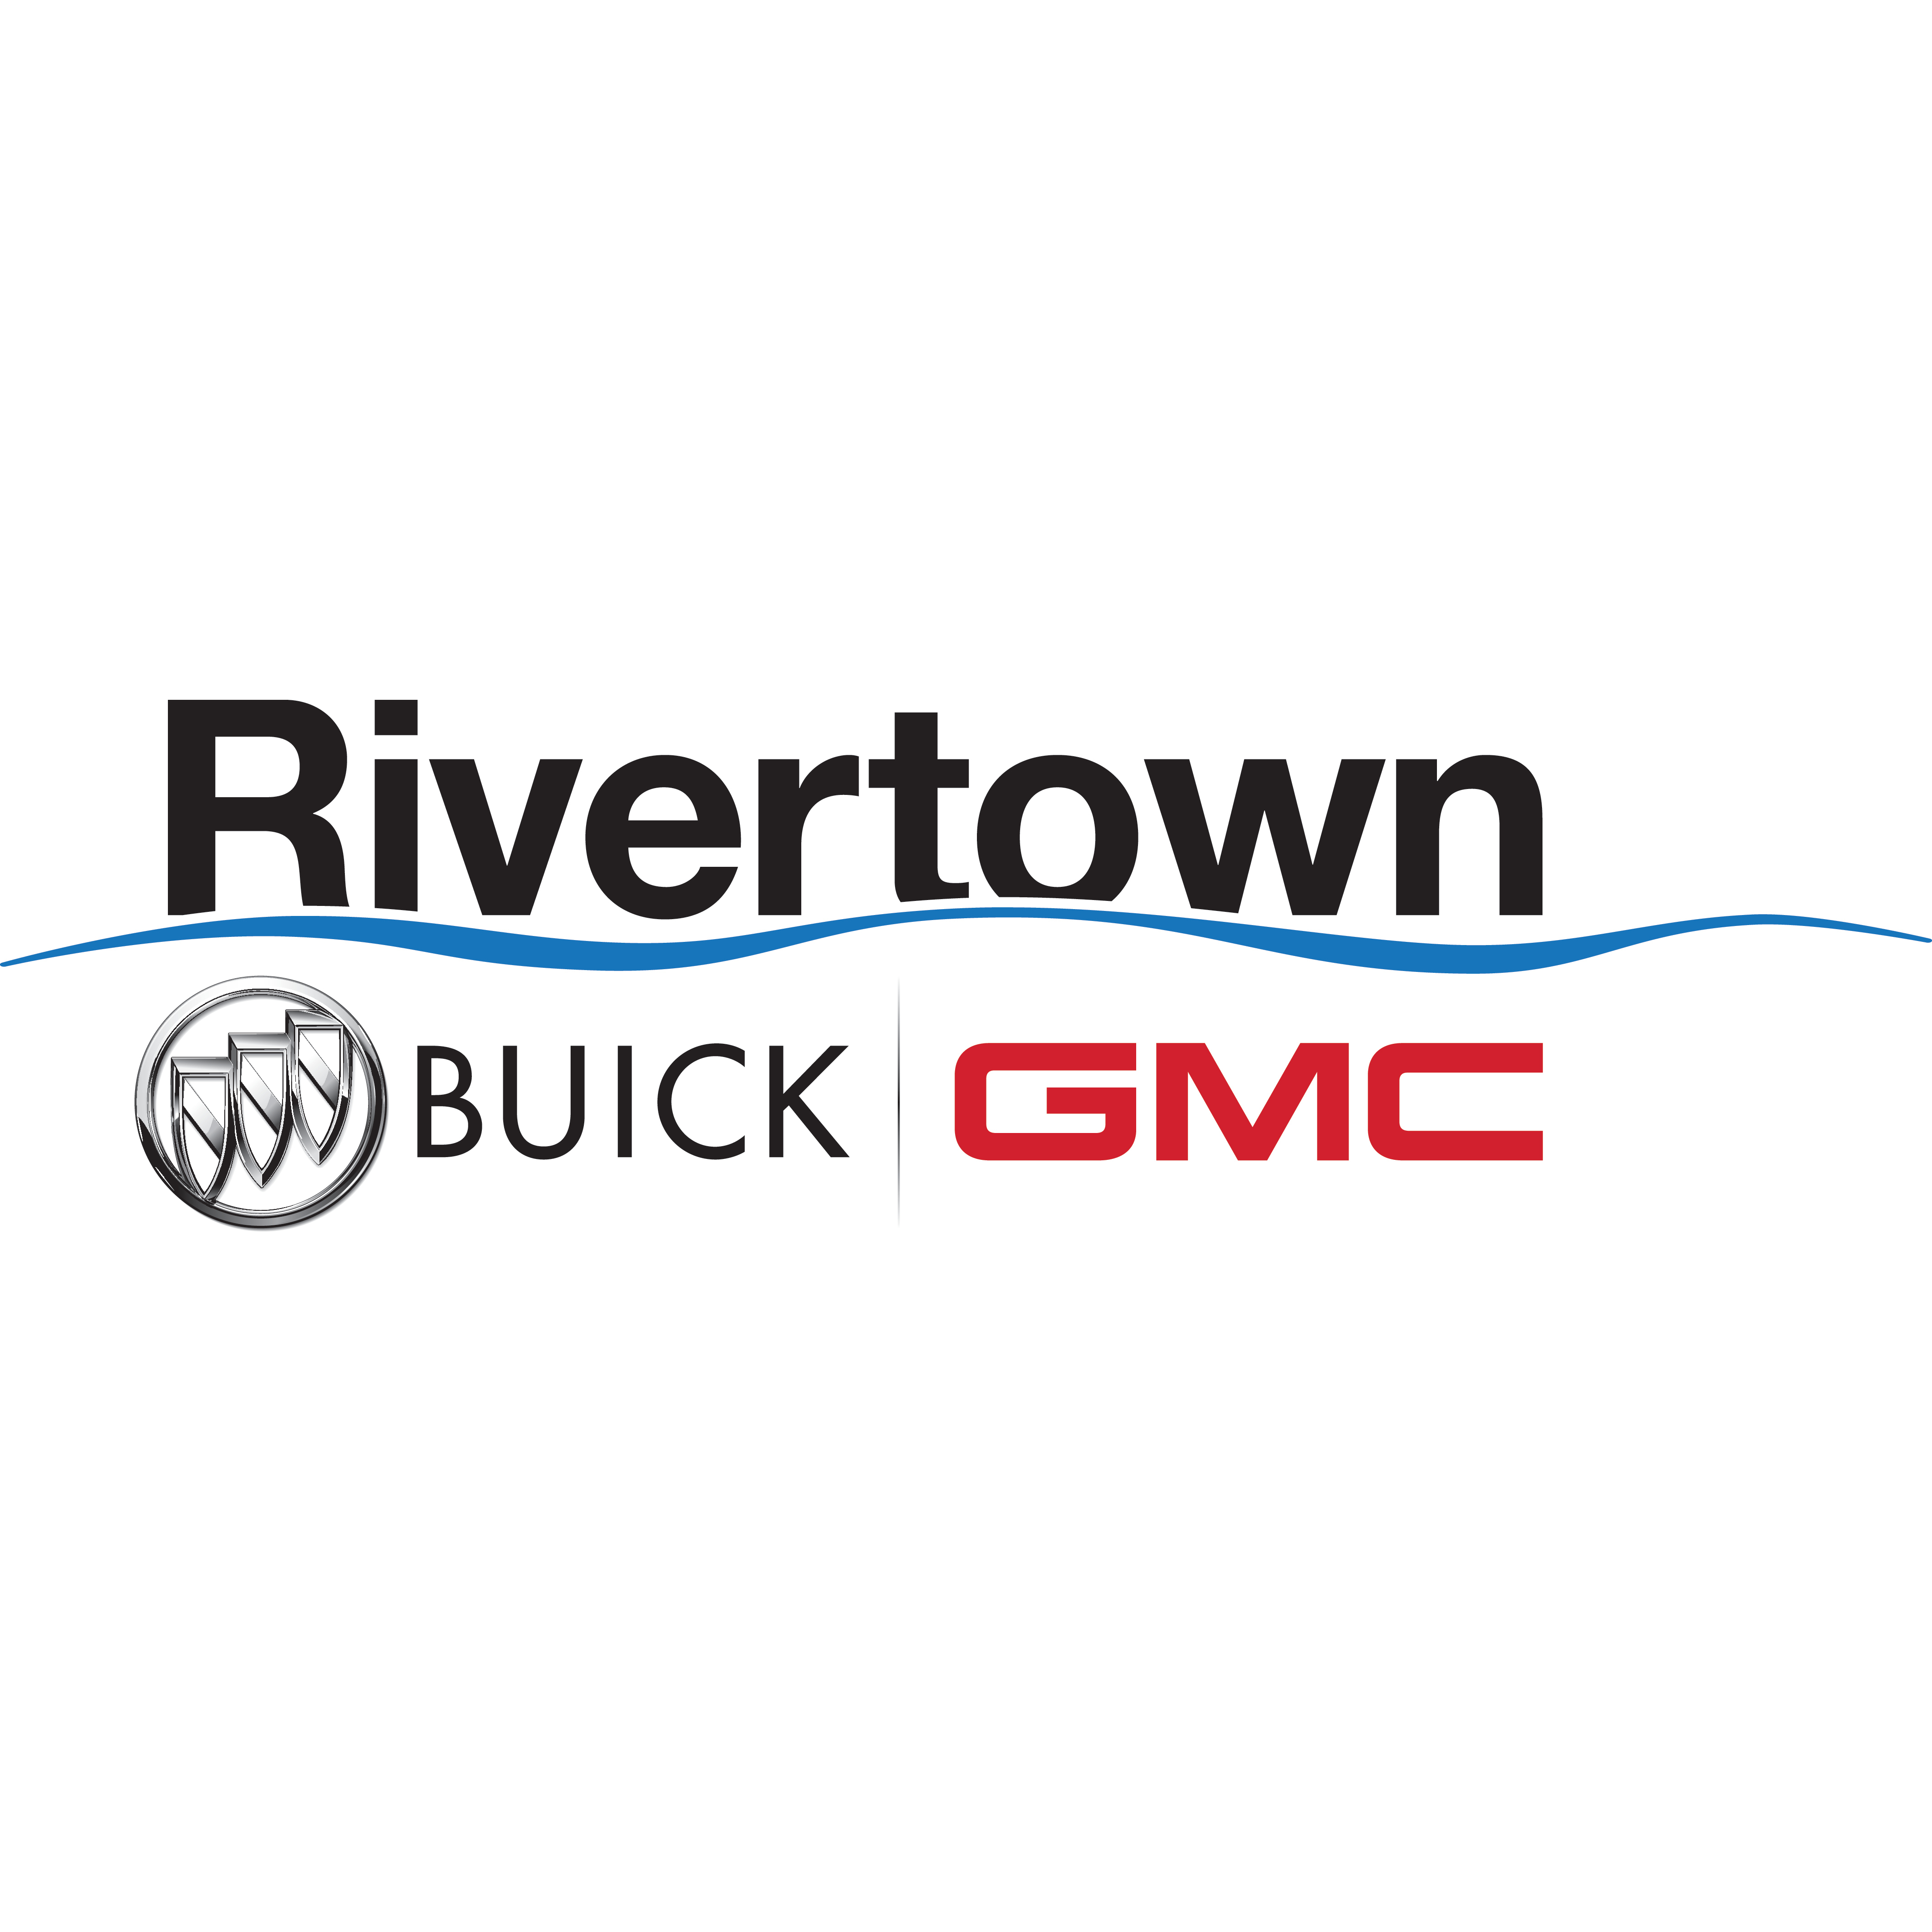 Buick Dealership Greenville Sc: Rivertown Buick GMC